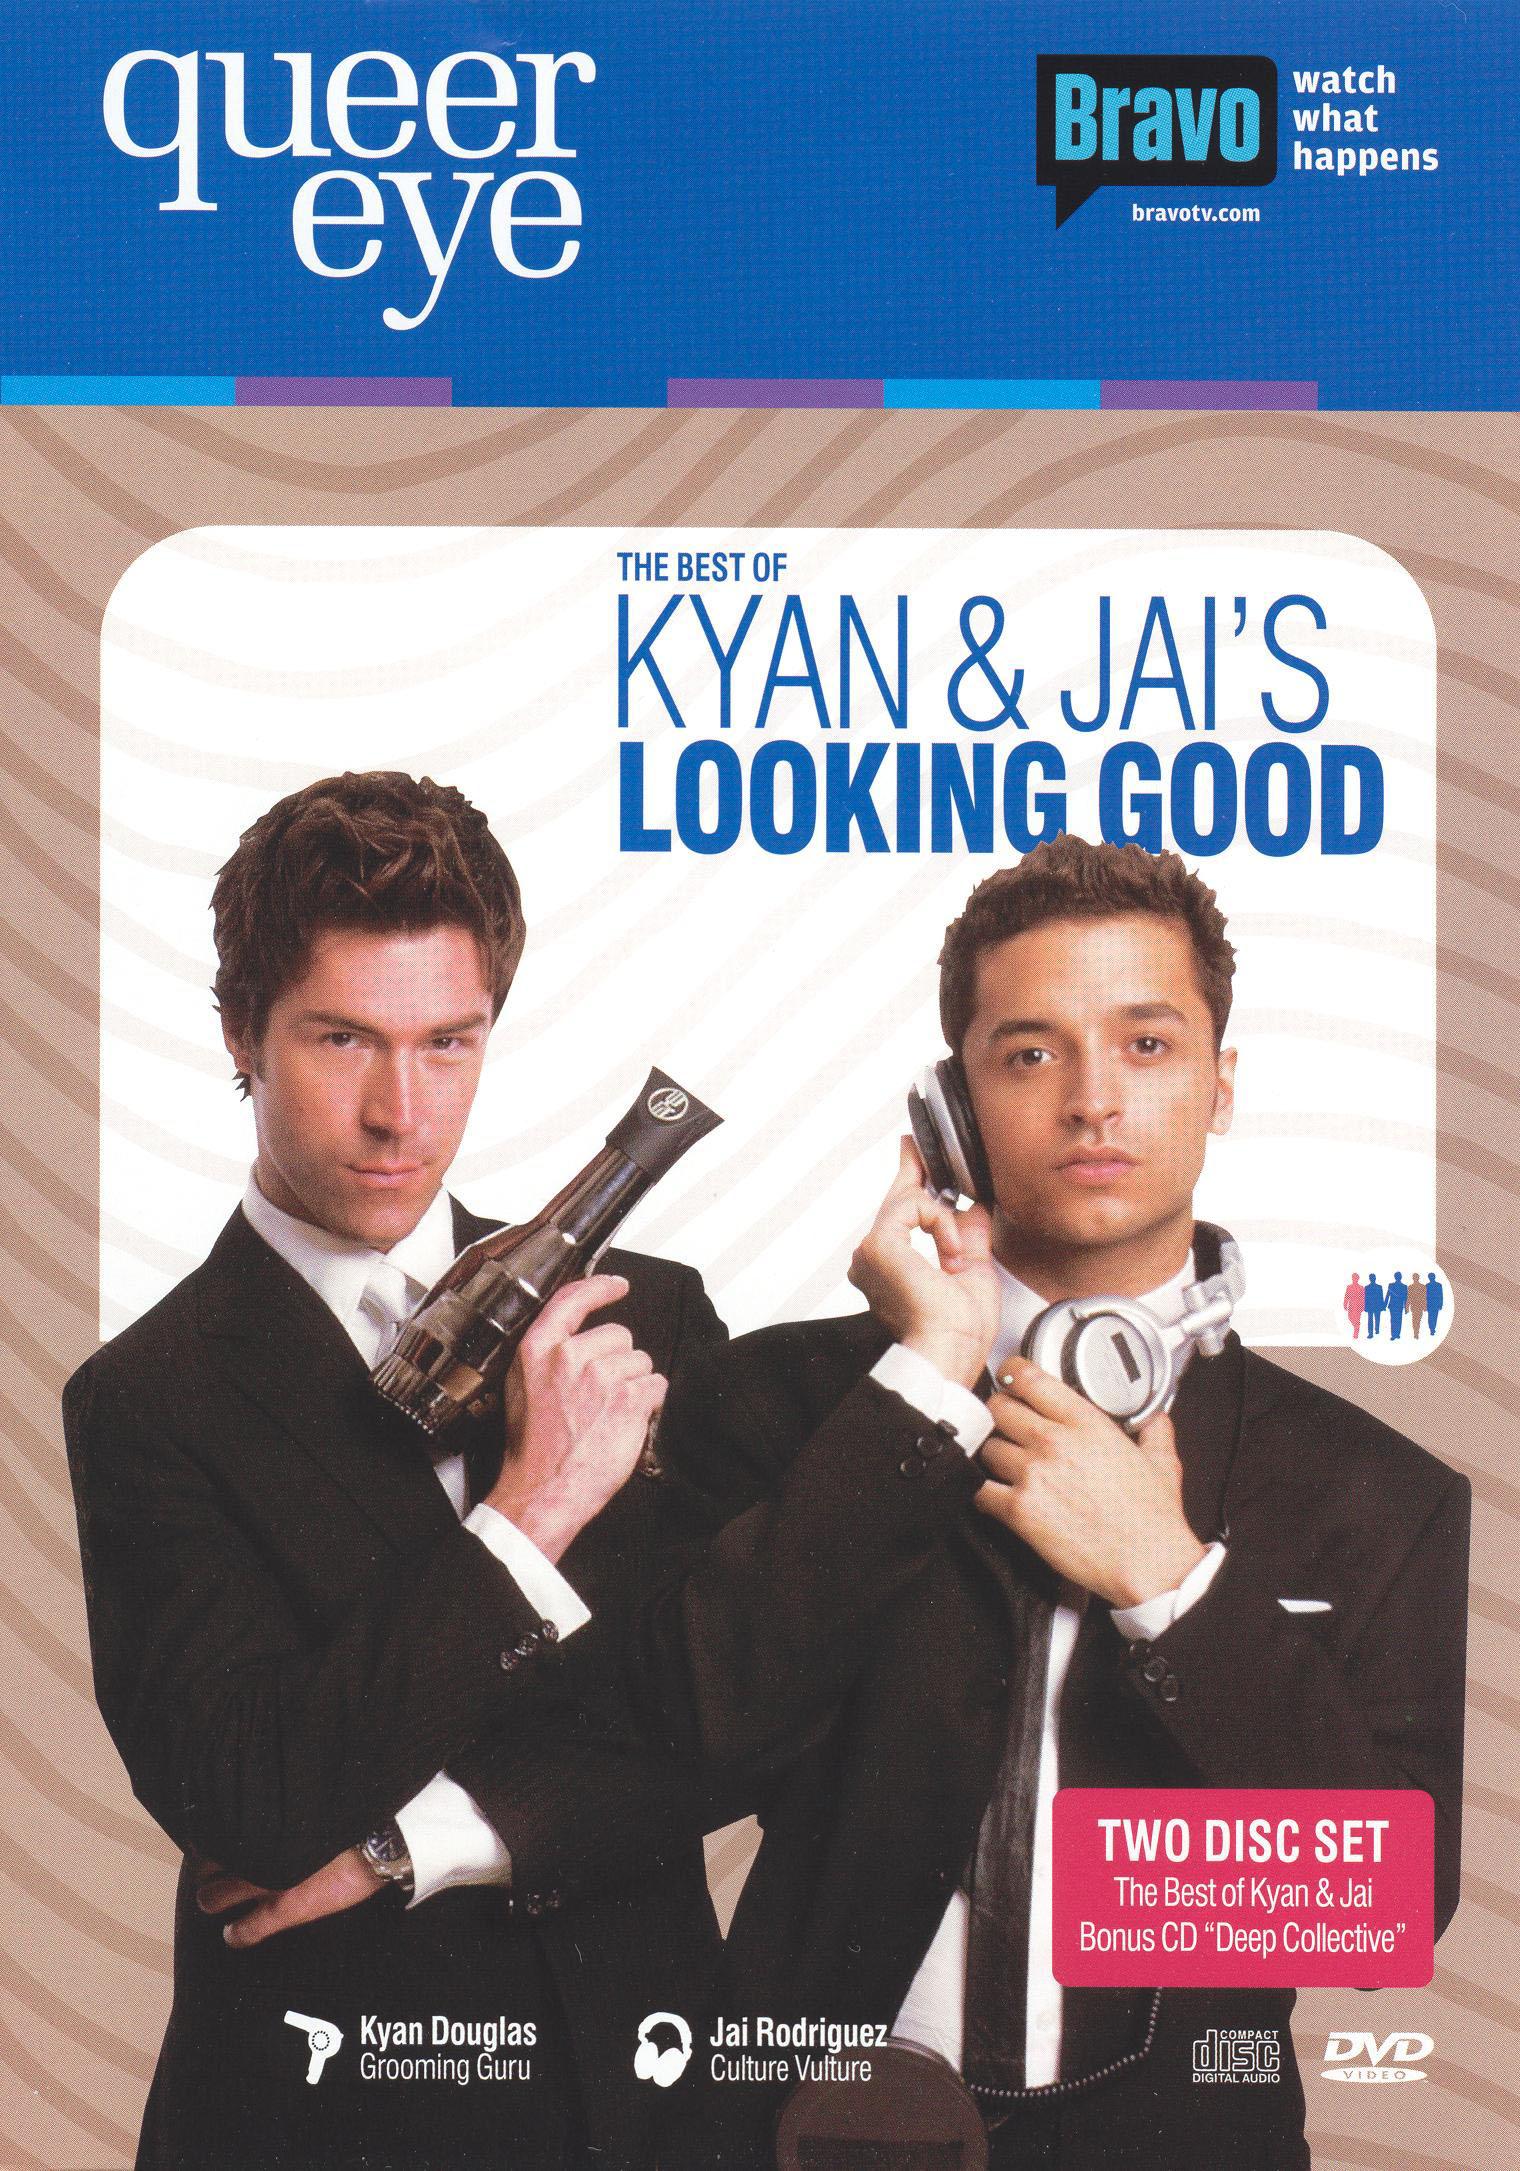 Queer Eye: The Best of Kyan and Jai's Looking Good